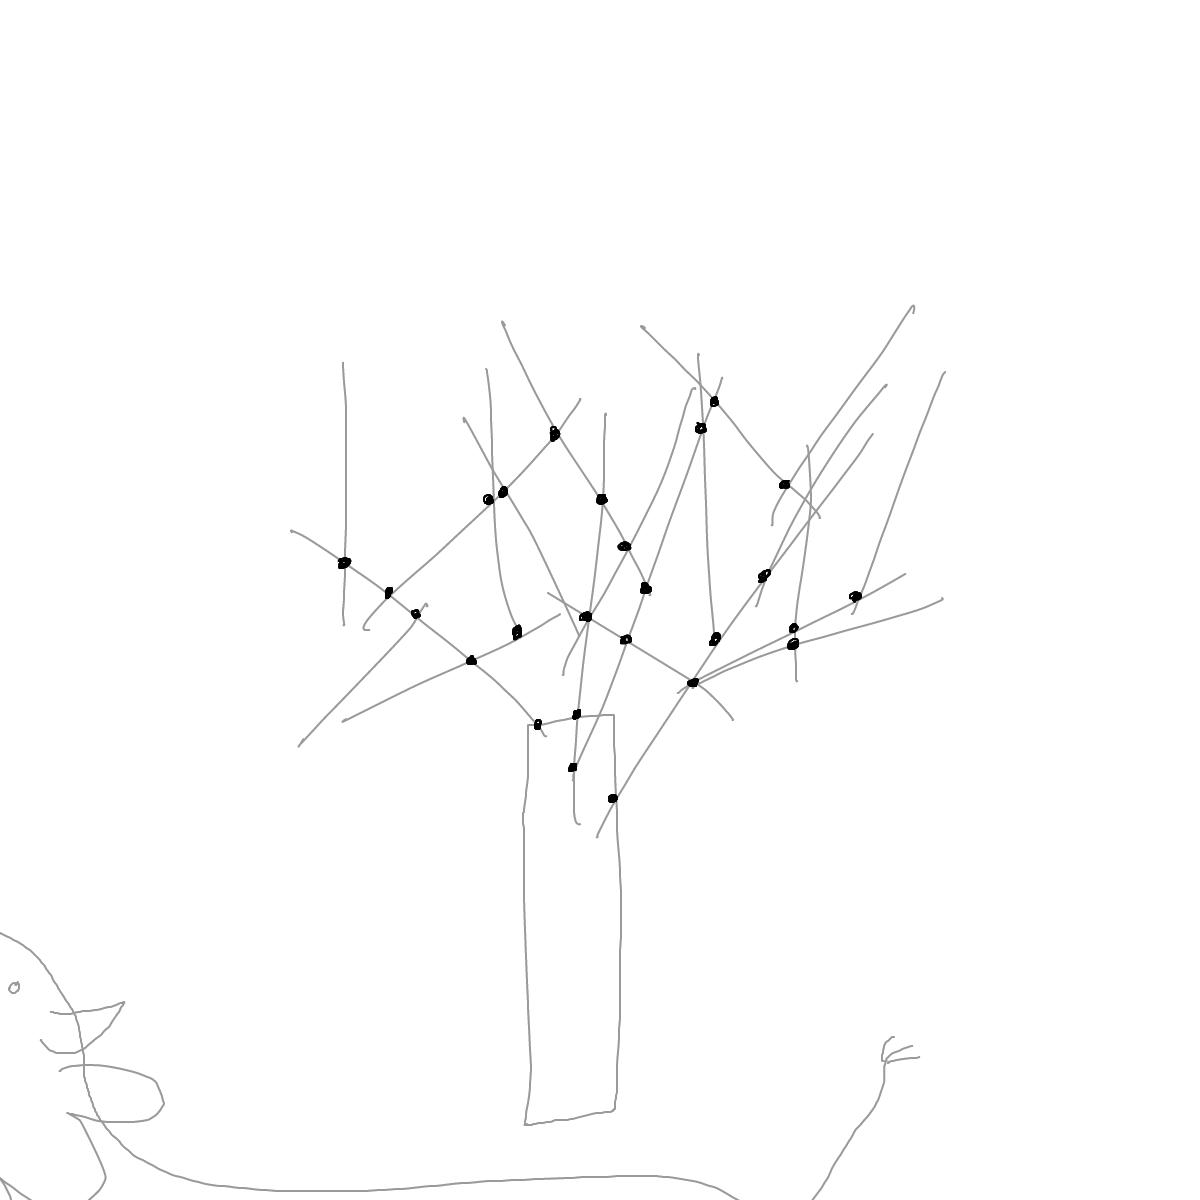 BAAAM drawing#2151 lat:52.4750366210937500lng: 13.4068984985351560